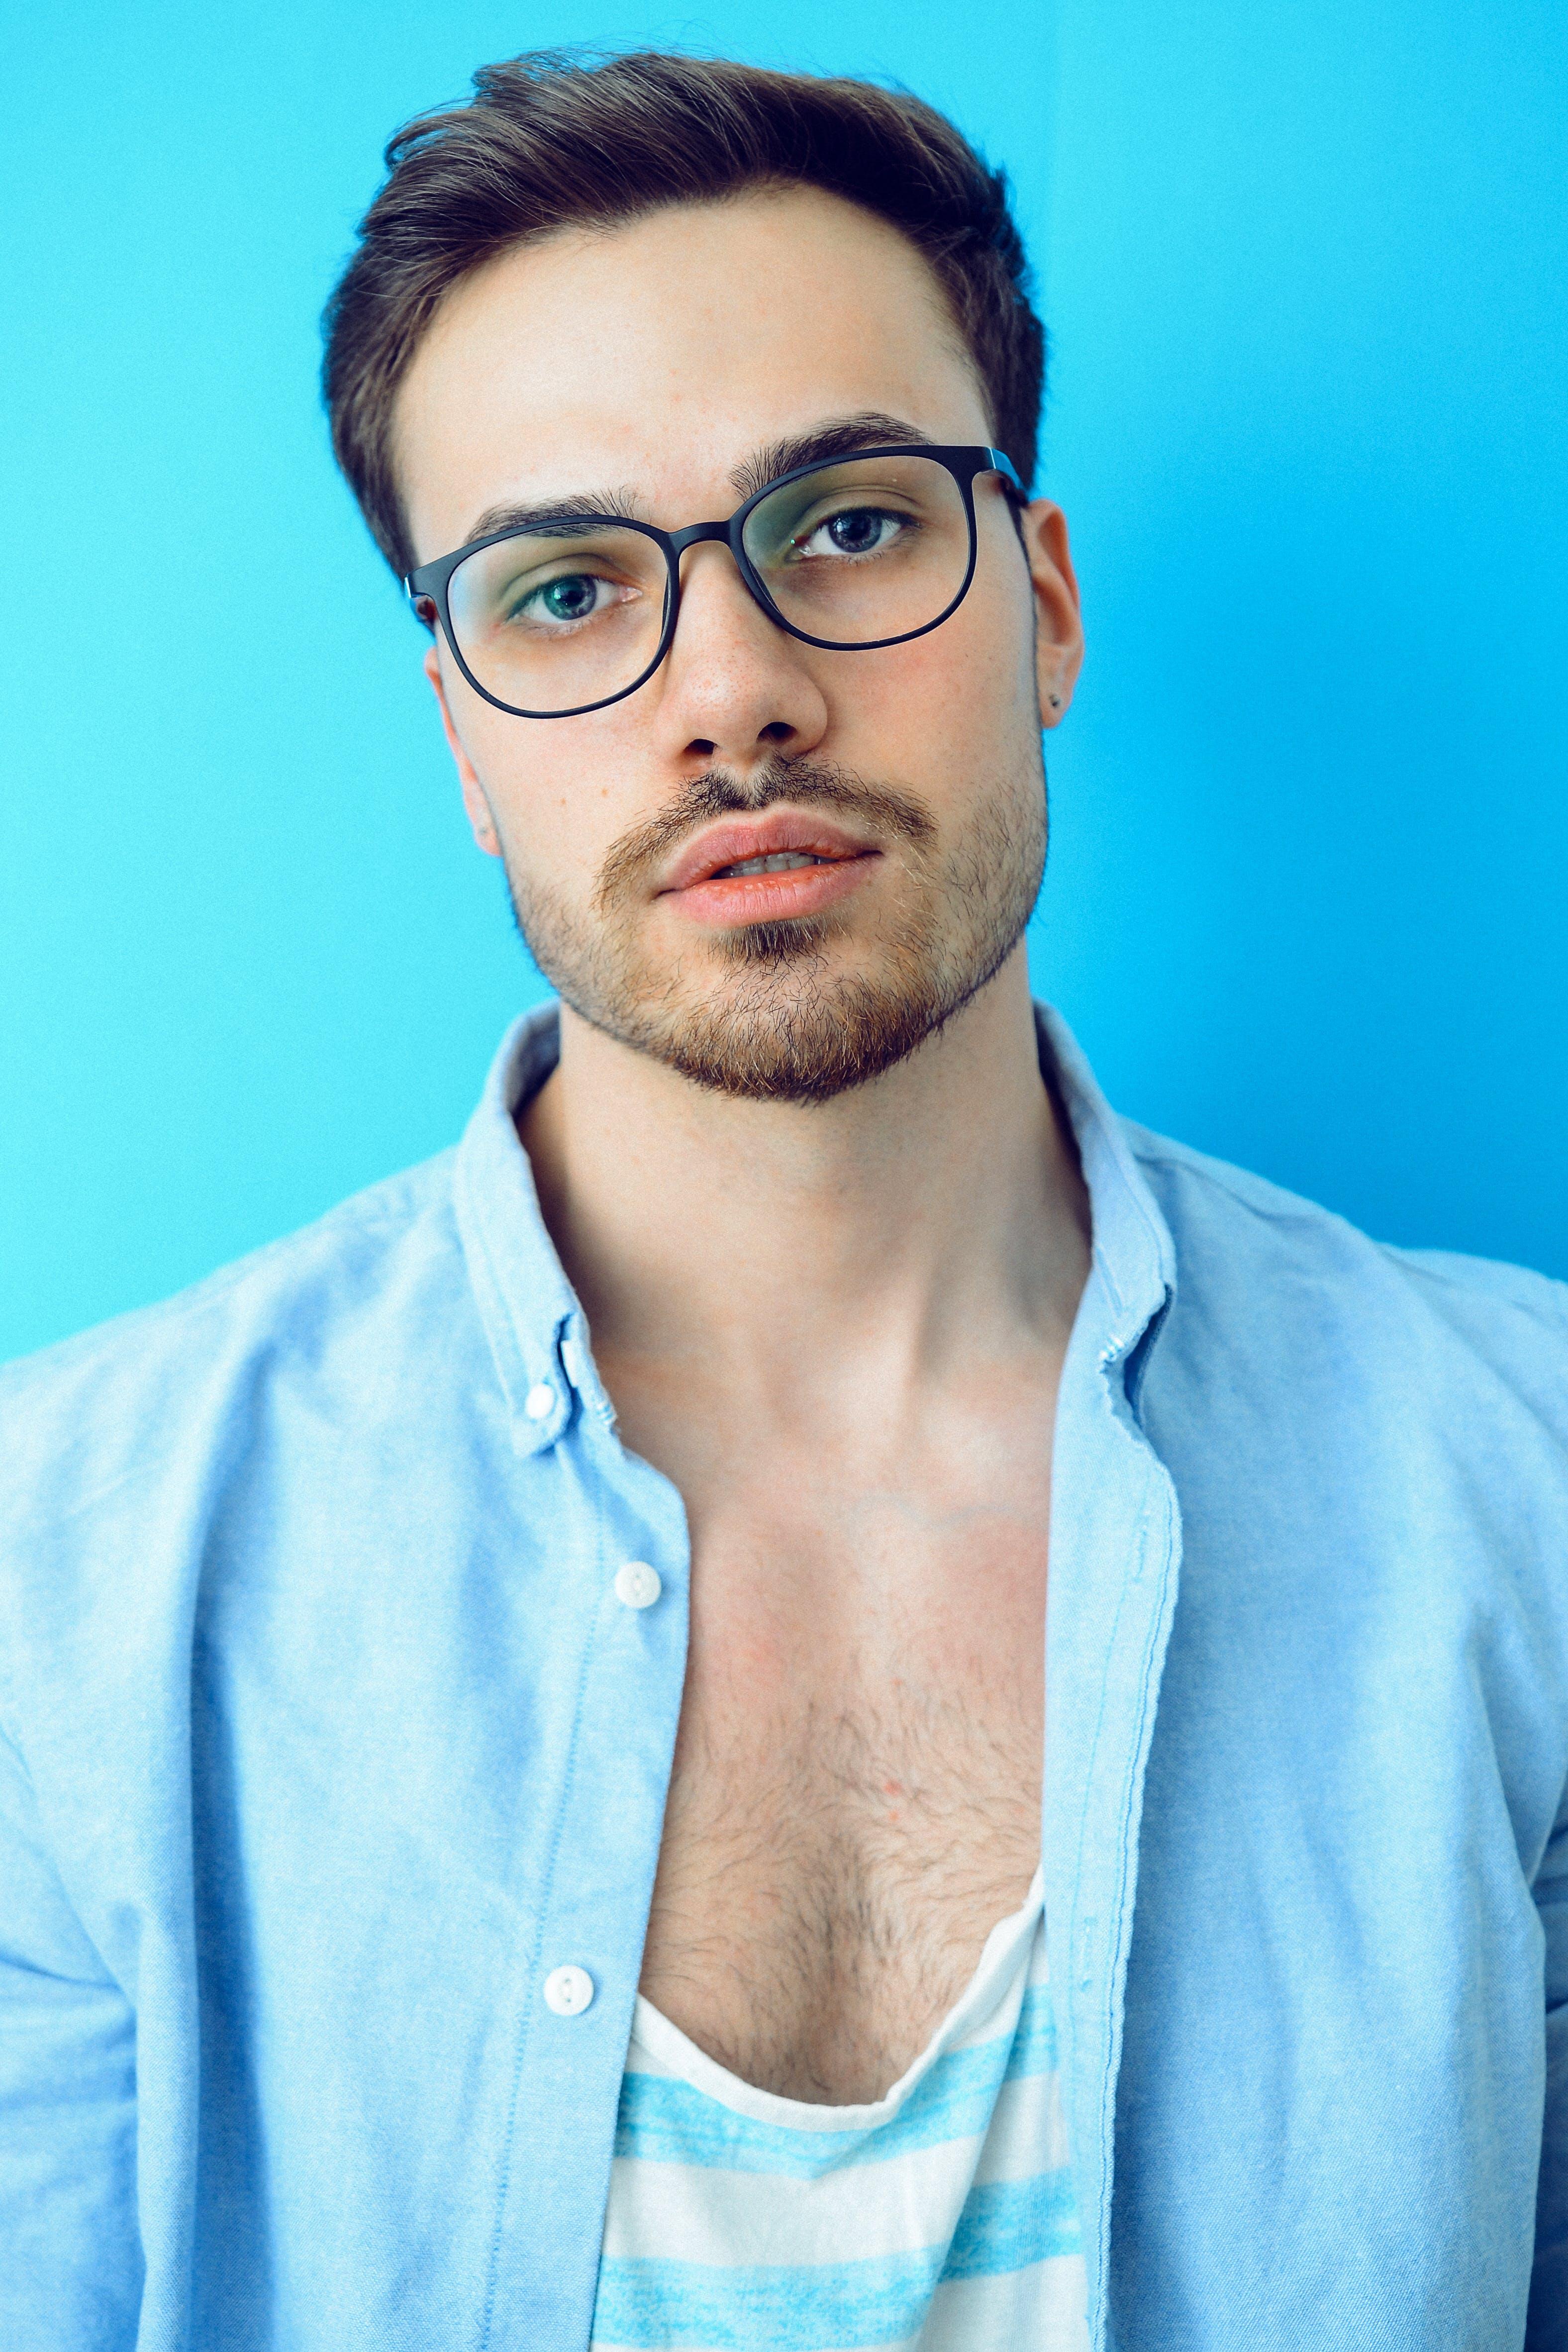 Man in Black Framed Eyeglasses and Blue Button-up Shirt